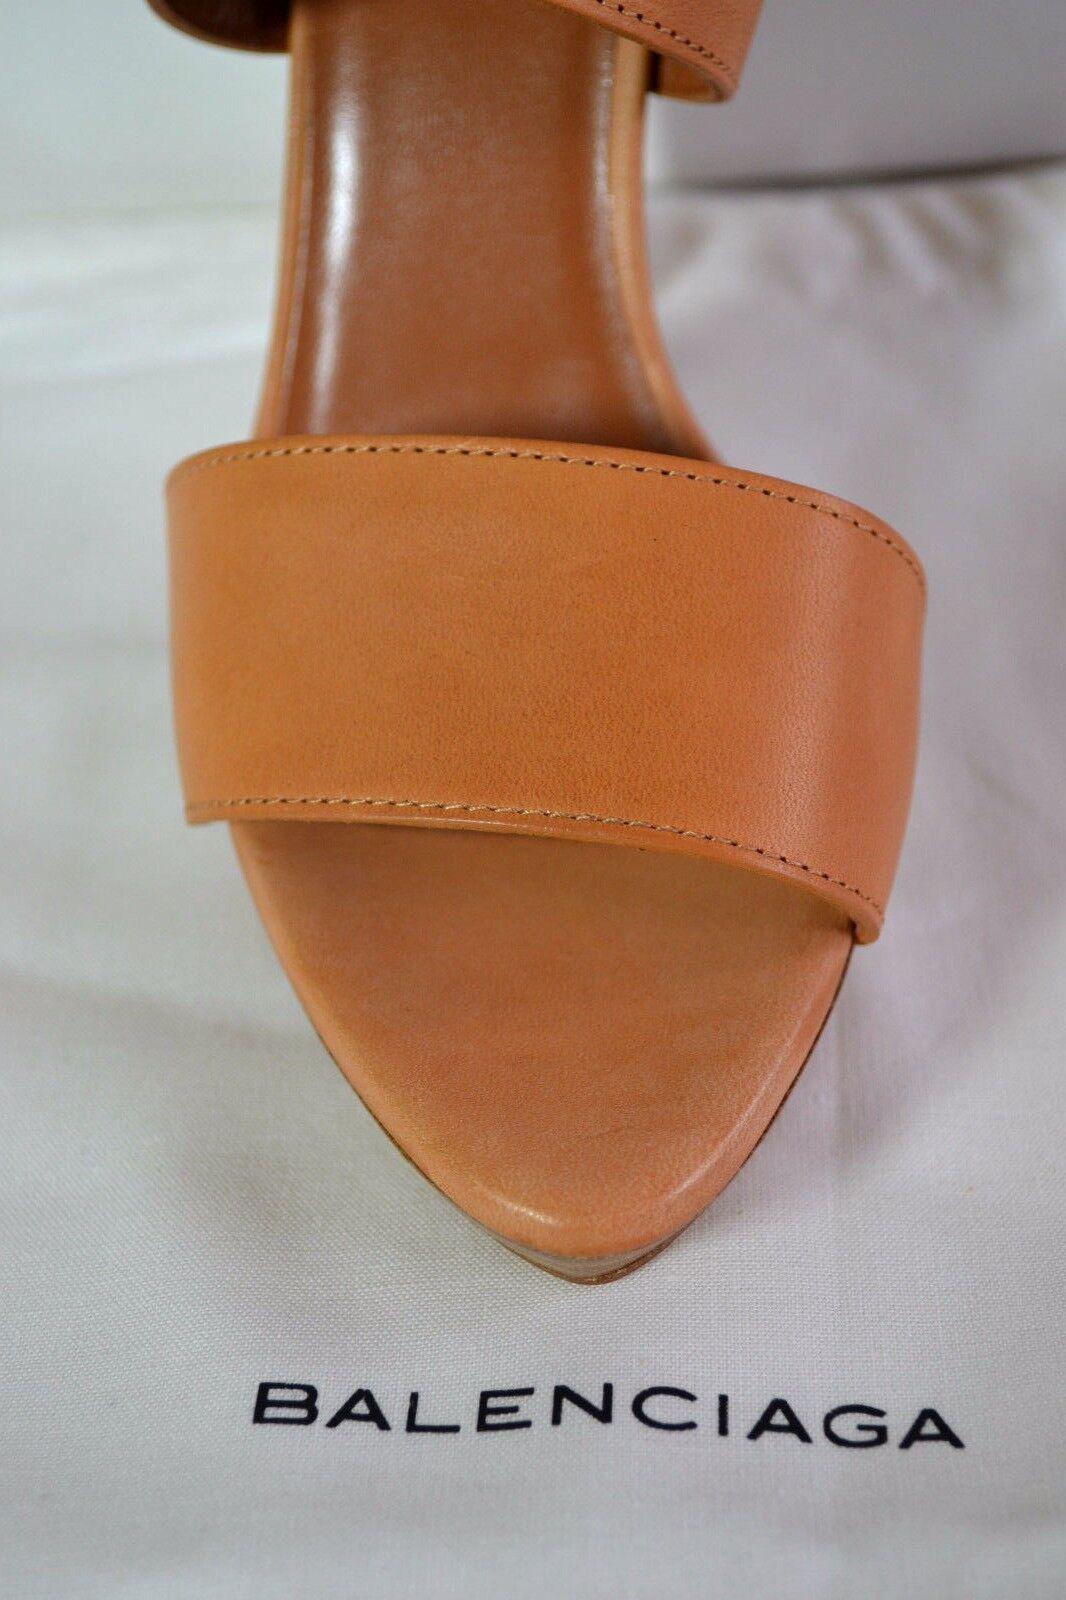 Balenciaga Schuhe Schuhe RÖMER ABSATZ SANDALETTE 37,5 UK 4,5 SANDALE  SANDALE 4,5  NEU e1af91